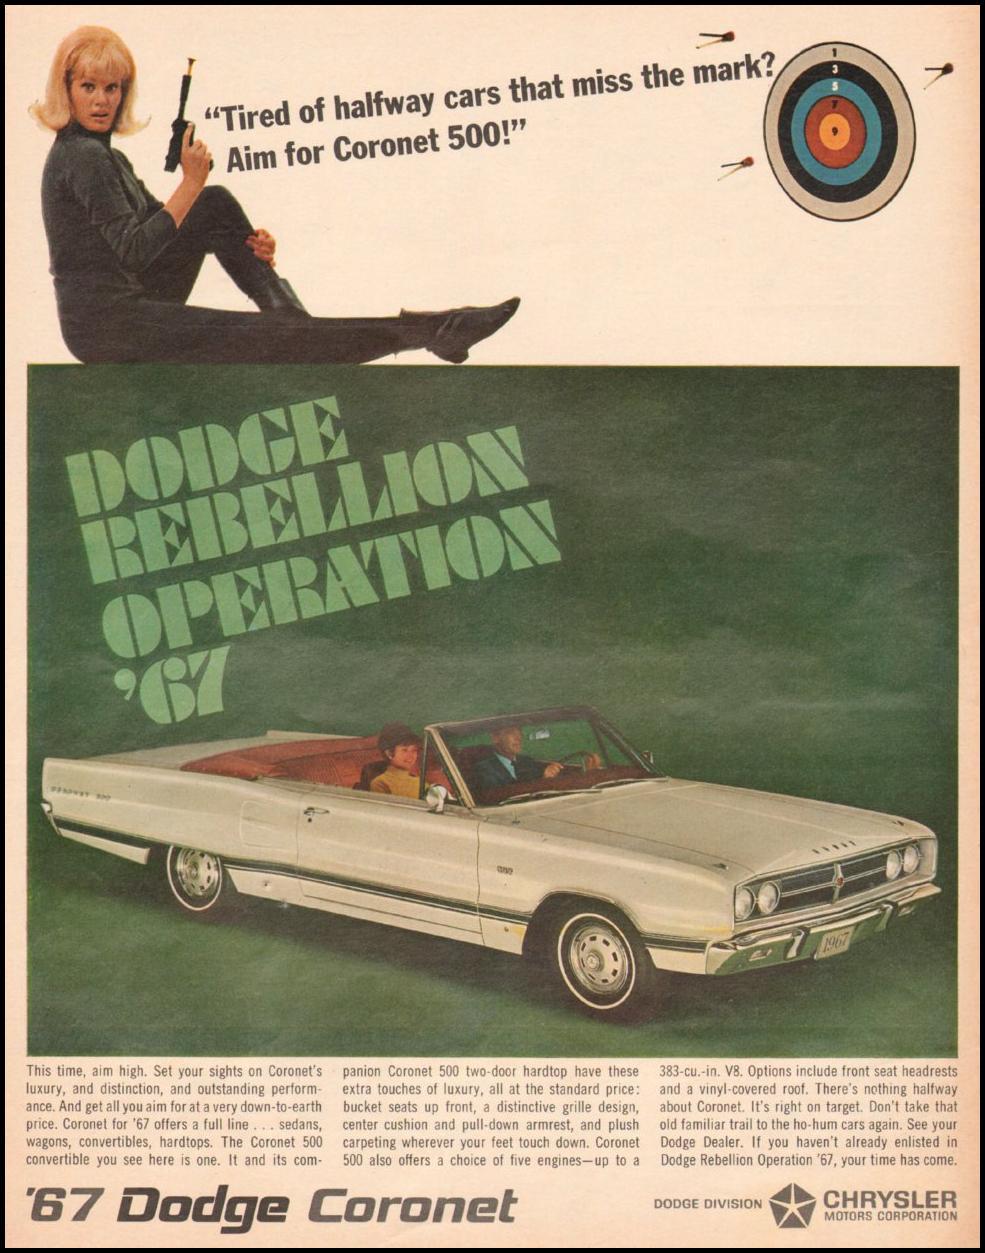 DODGE AUTOMOBILES LIFE 11/04/1966